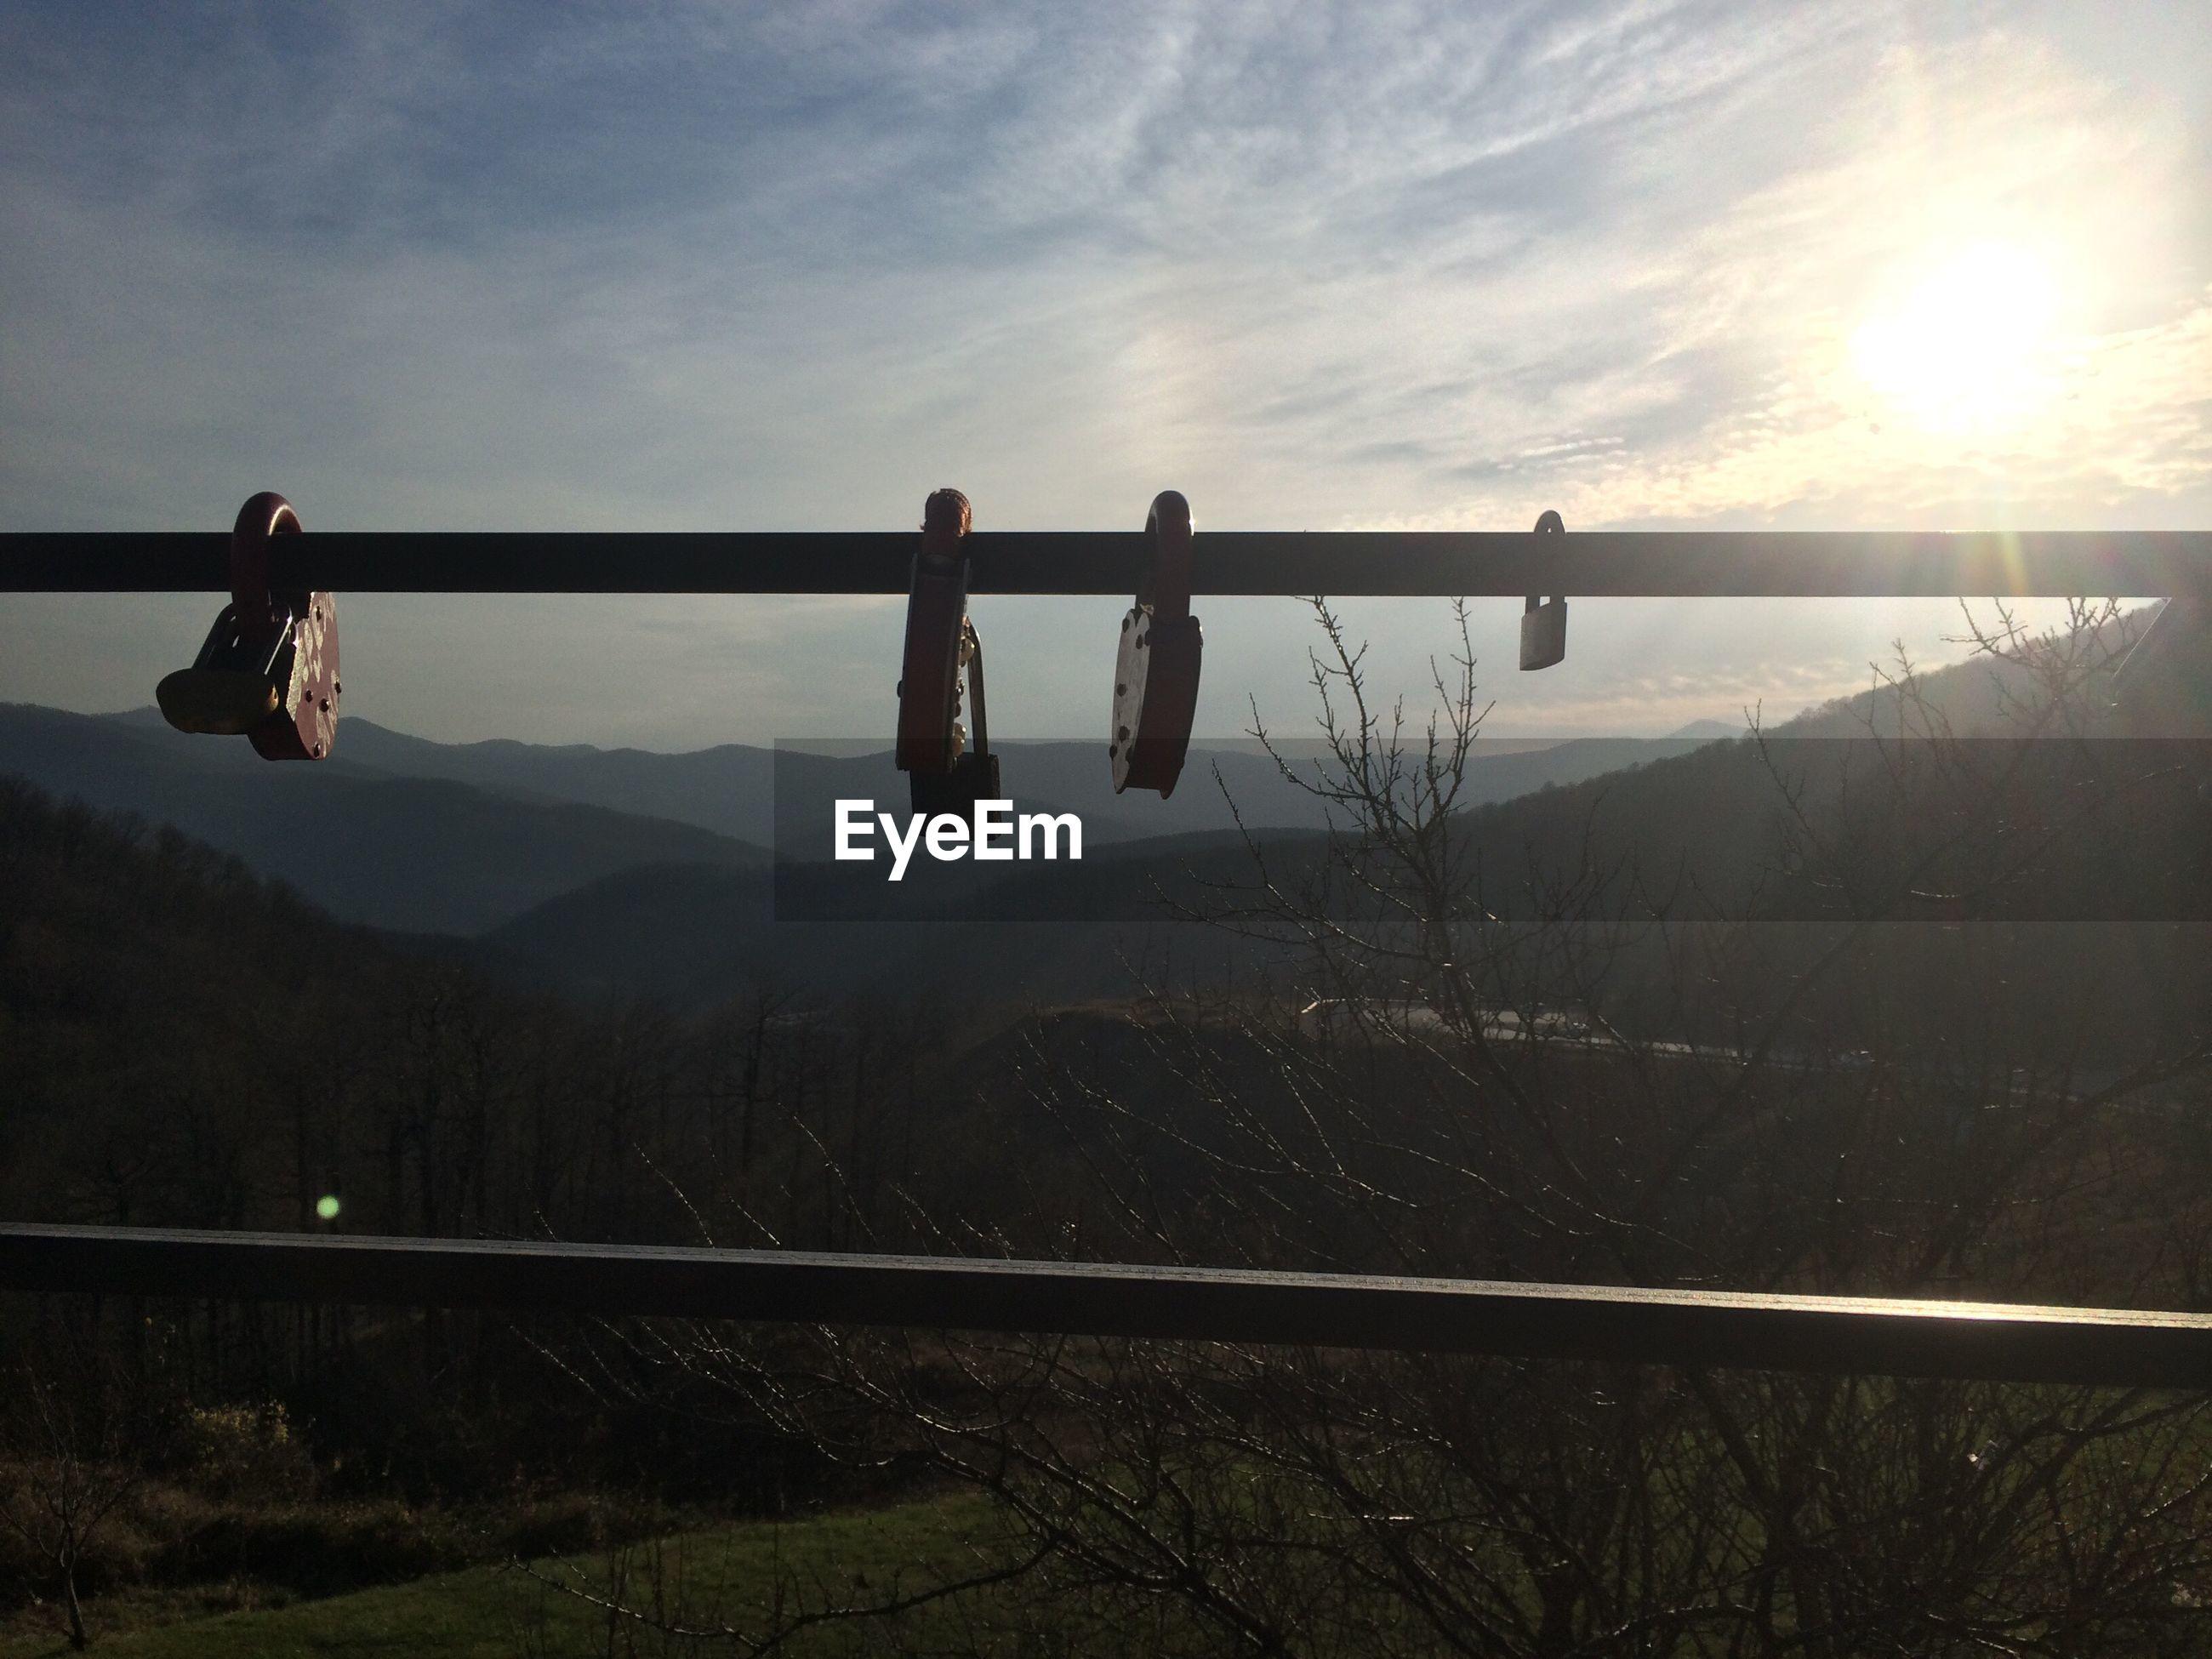 Padlocks hanging on railing against mountains